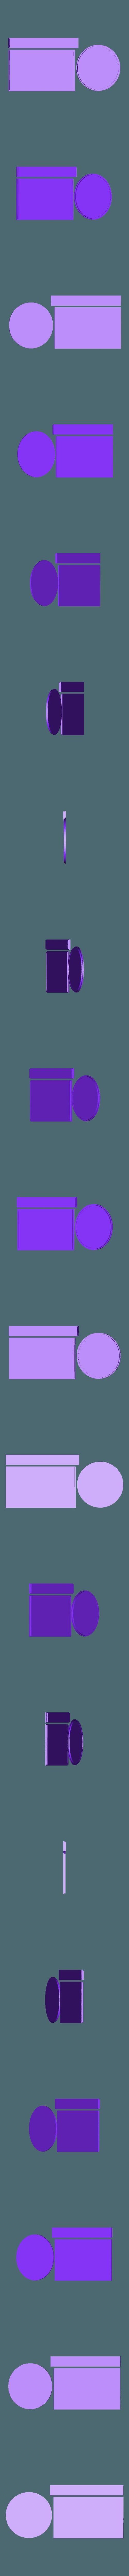 LogoCassetteTemplate.stl Download free STL file Cassette Tape Case with Customizable Logos / Album Art • 3D printable model, tonyyoungblood